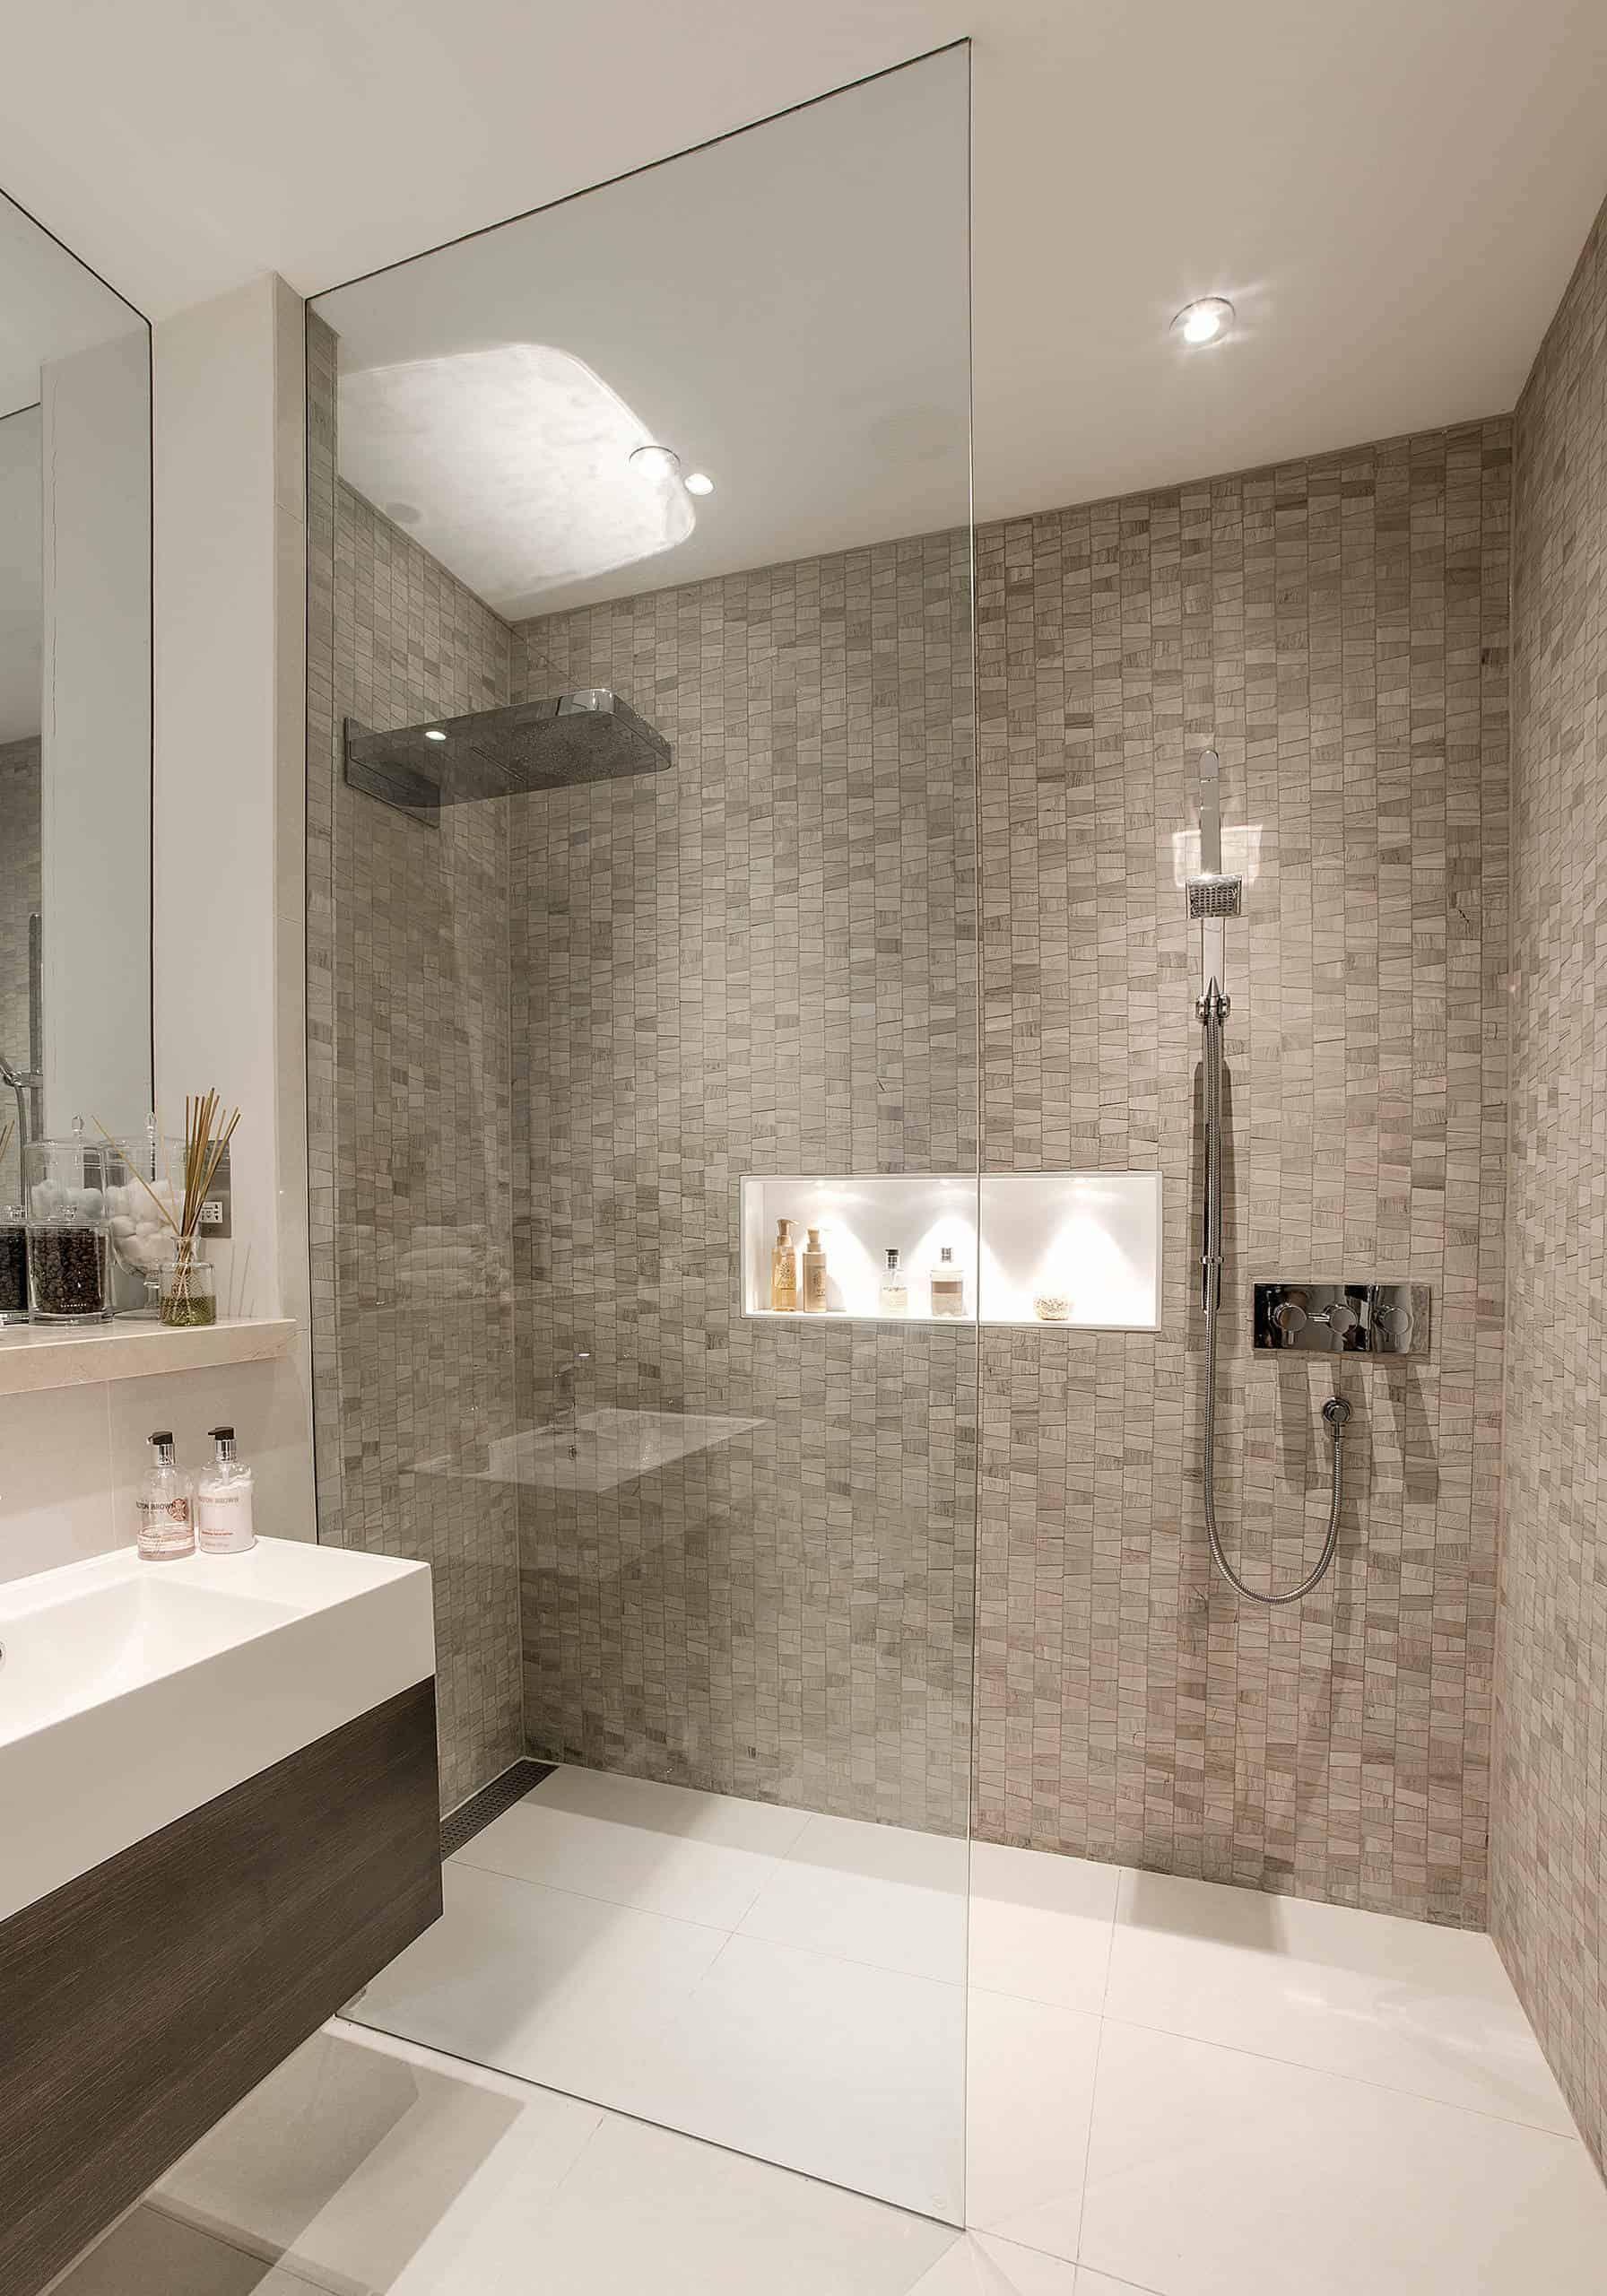 36 Doorless Walk In Shower Ideas And Designs 2020 Edition Small Bathroom Renovations Bathroom Shower Design Modern Bathroom